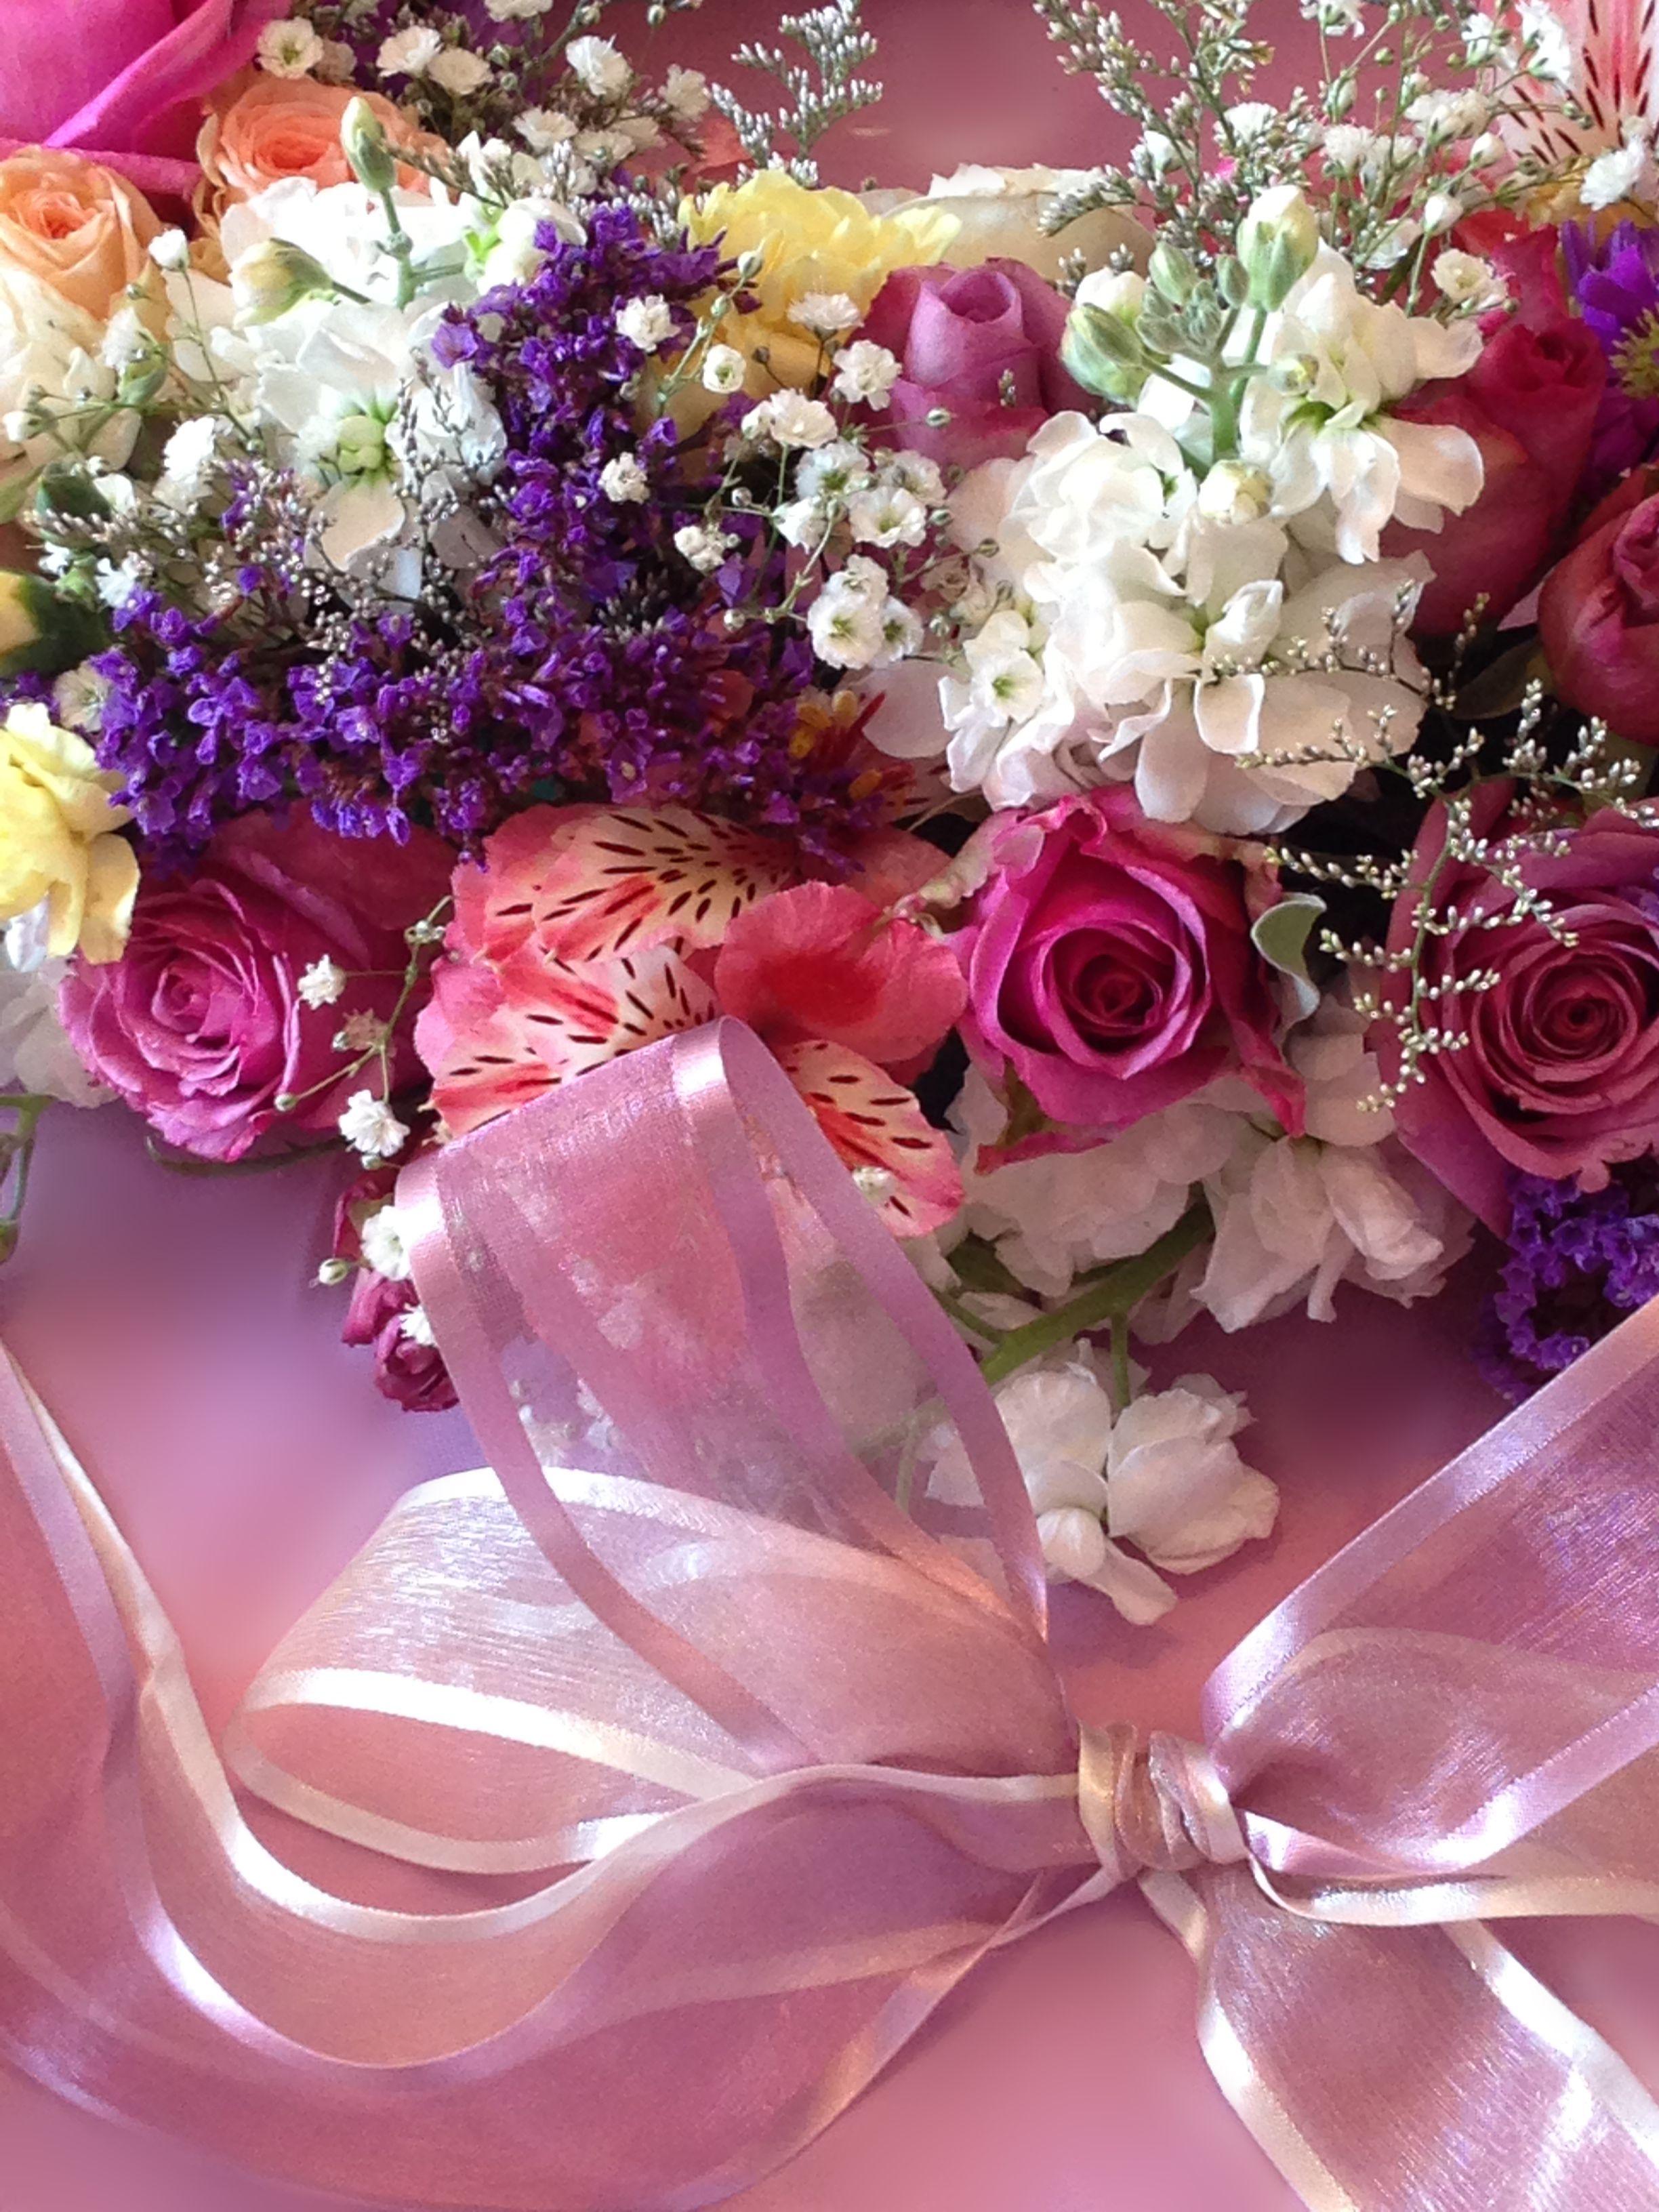 Pinterest Baby Shower Flower Arrangements 2448 x 3264